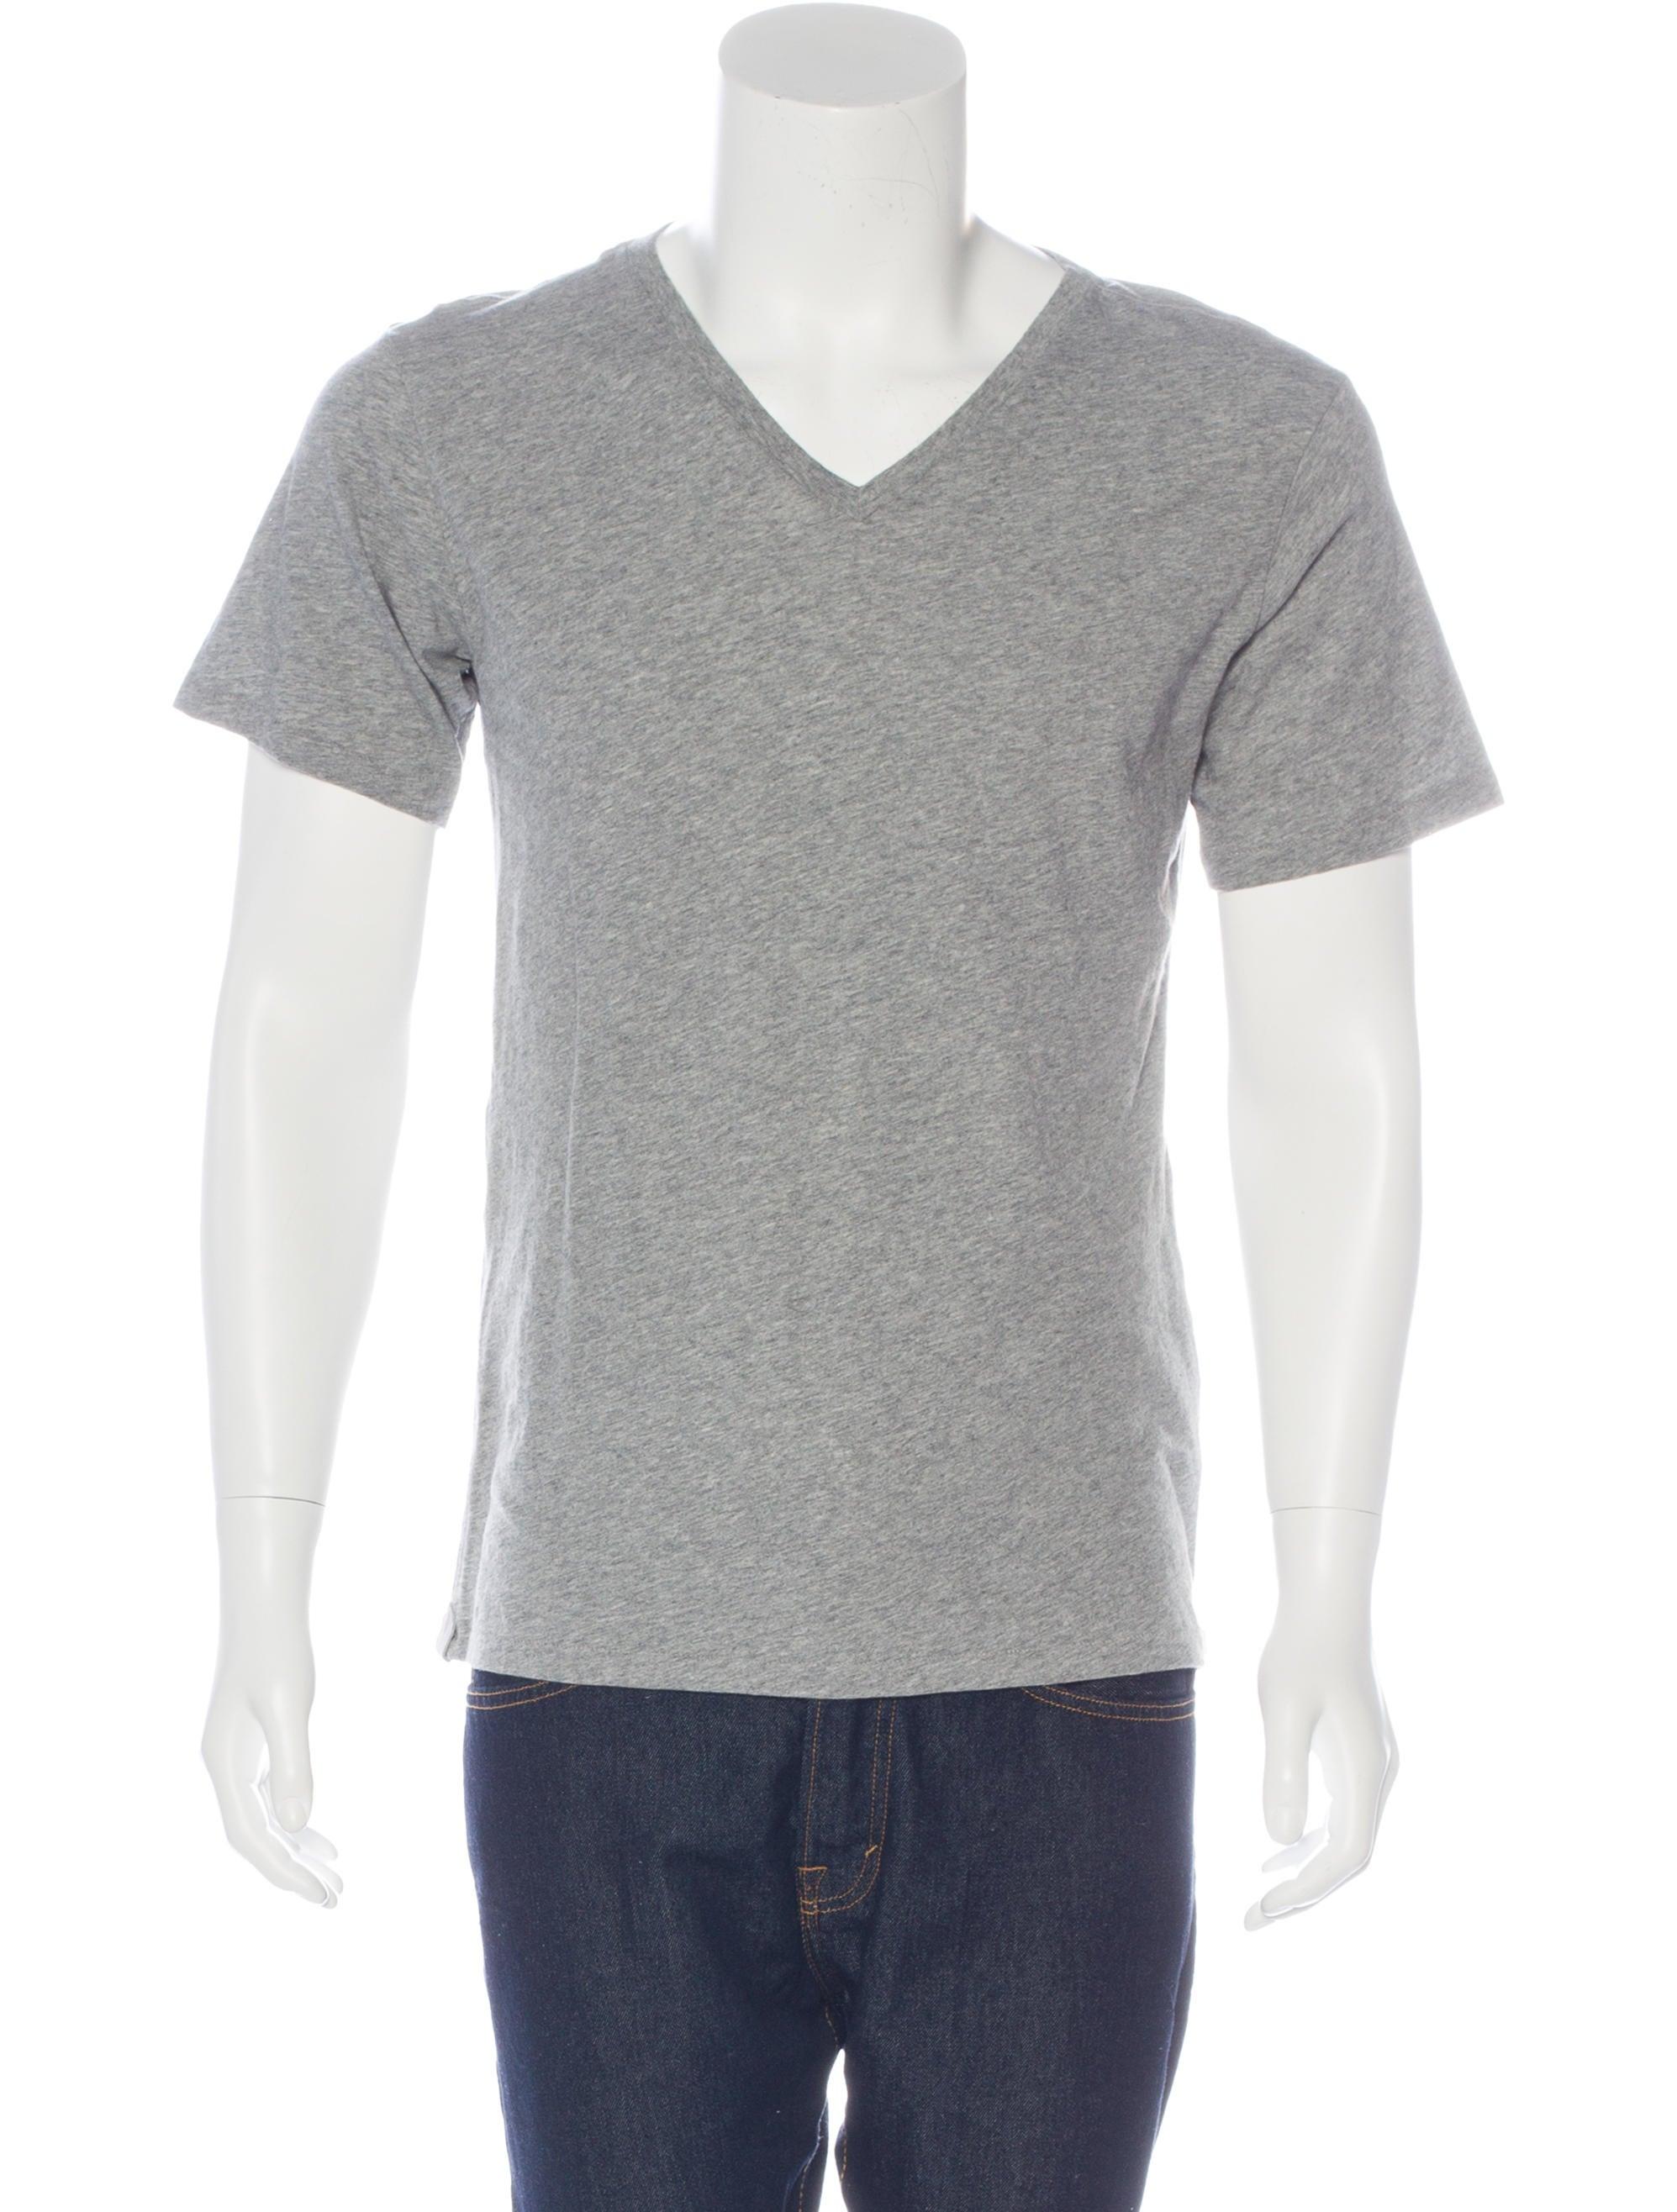 Rag Bone Heathered V Neck T Shirt Clothing